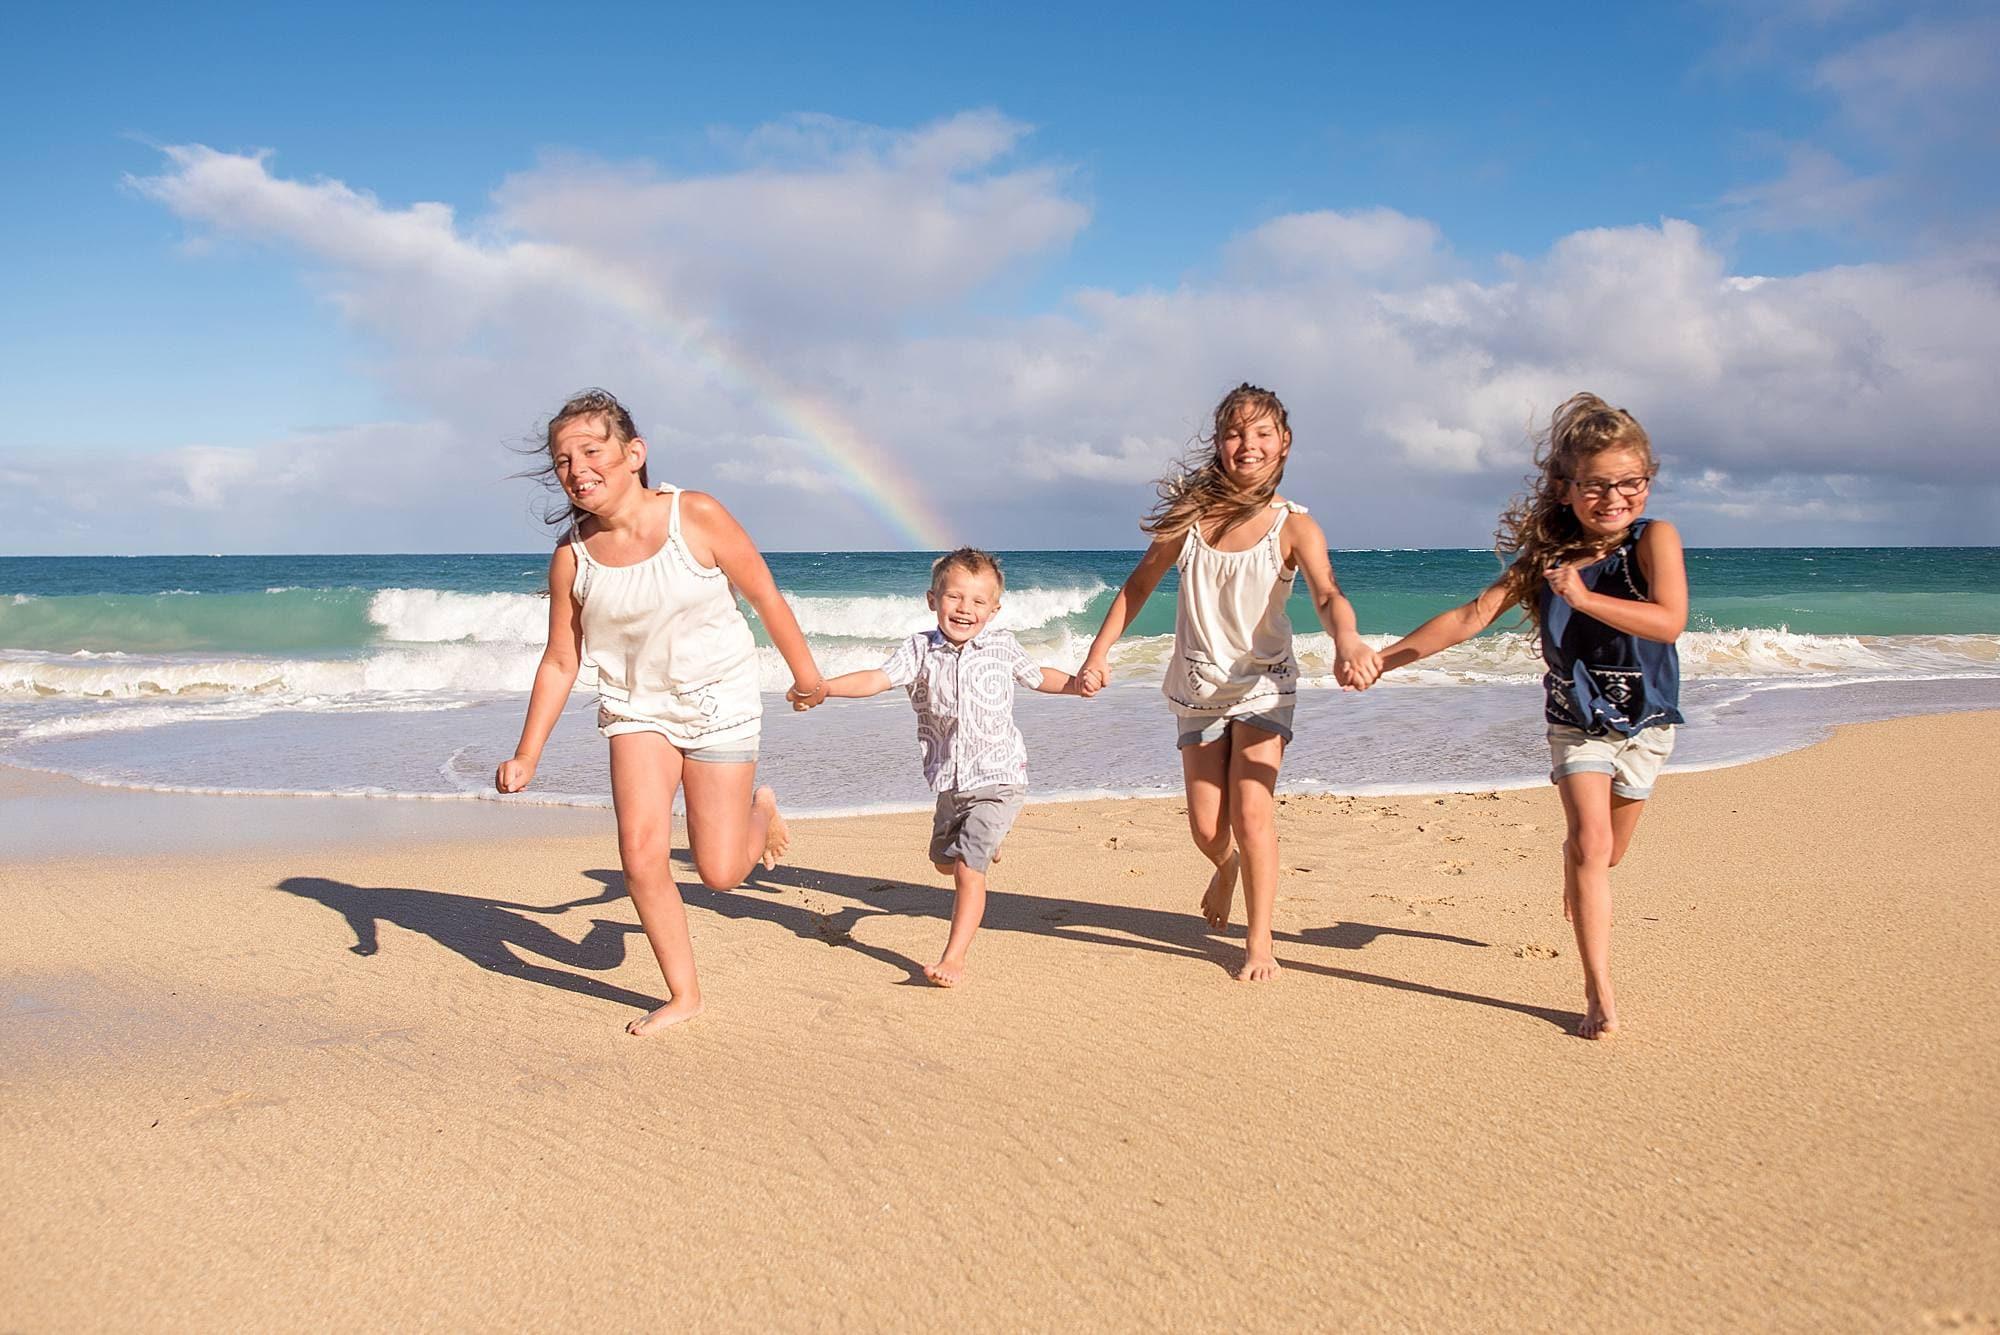 kids running on beach with rainbow